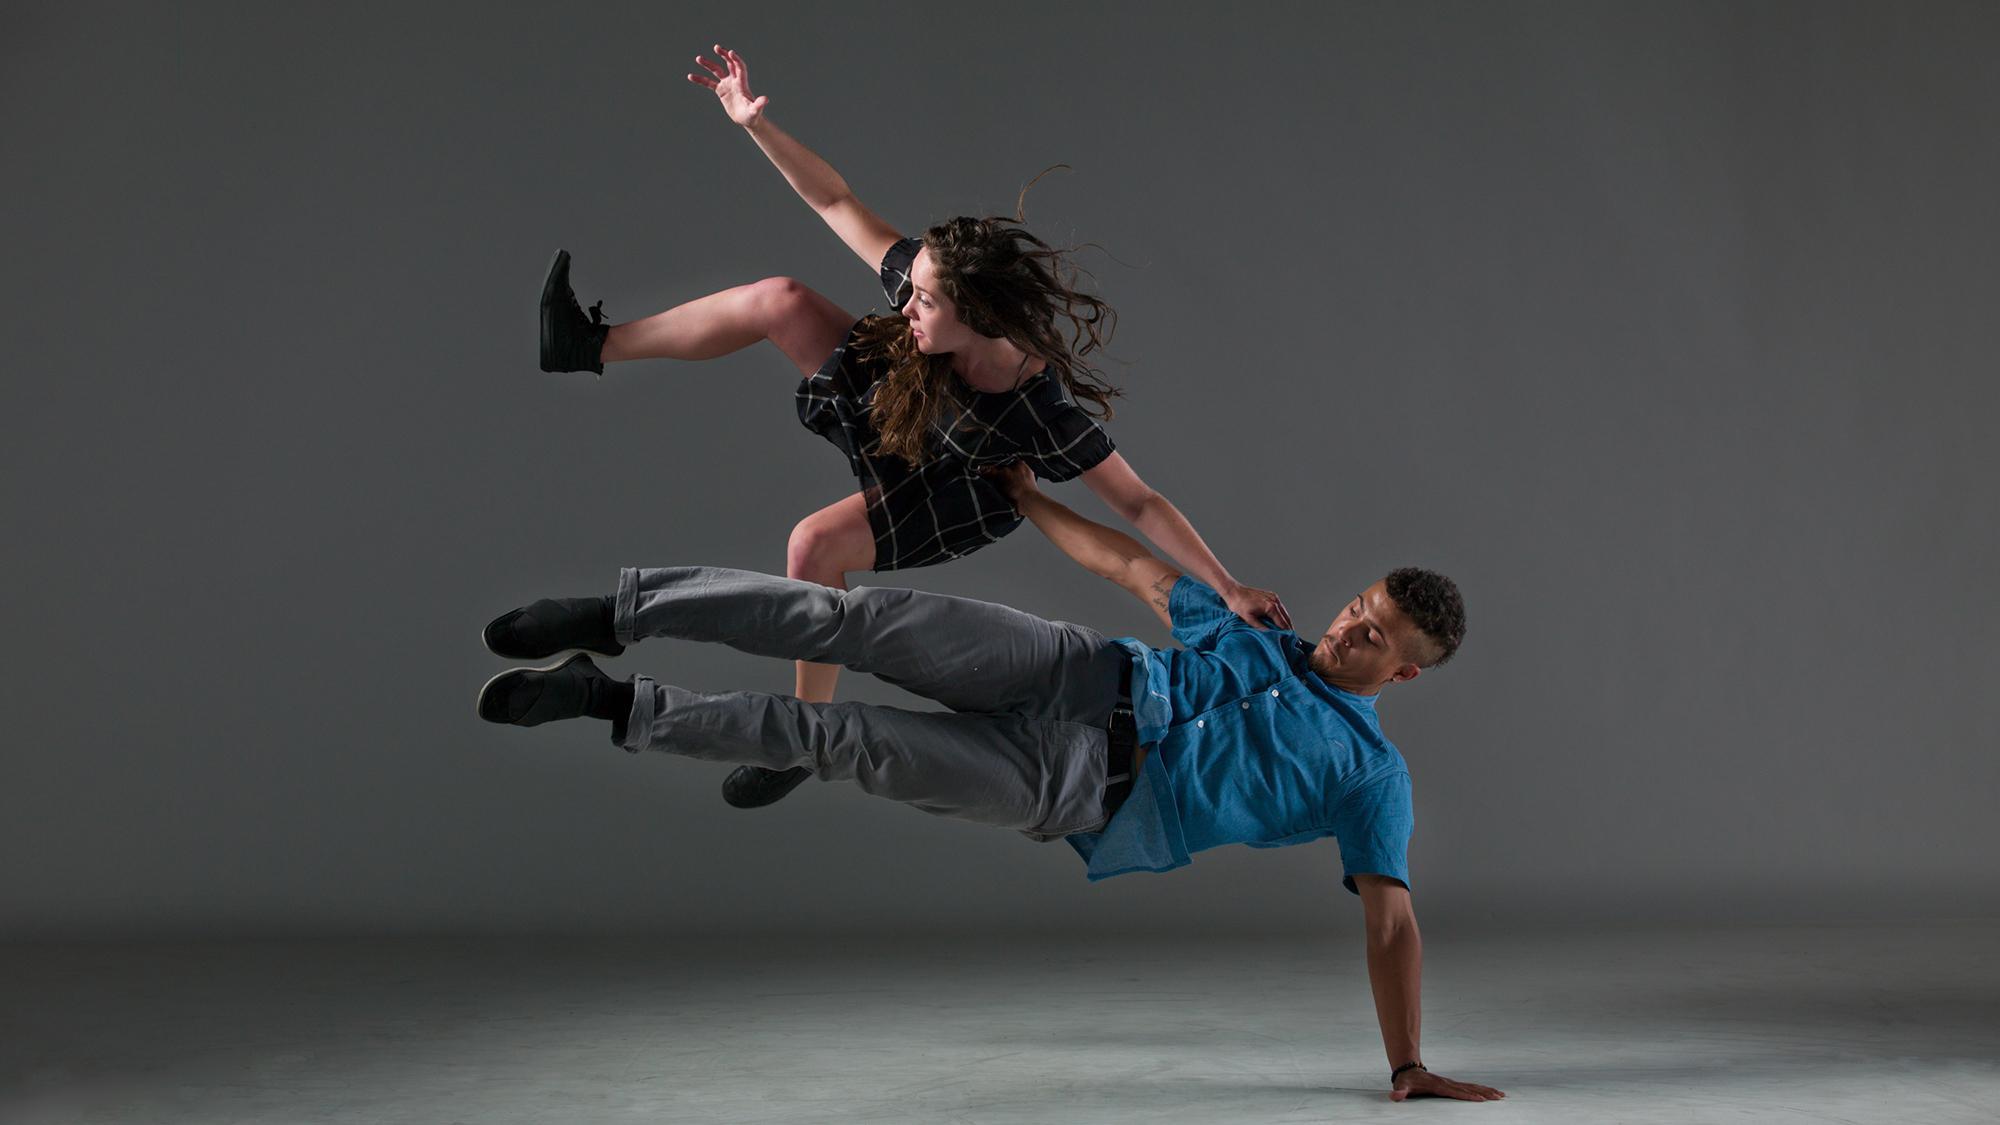 Shay Kuebler - Danse Danse